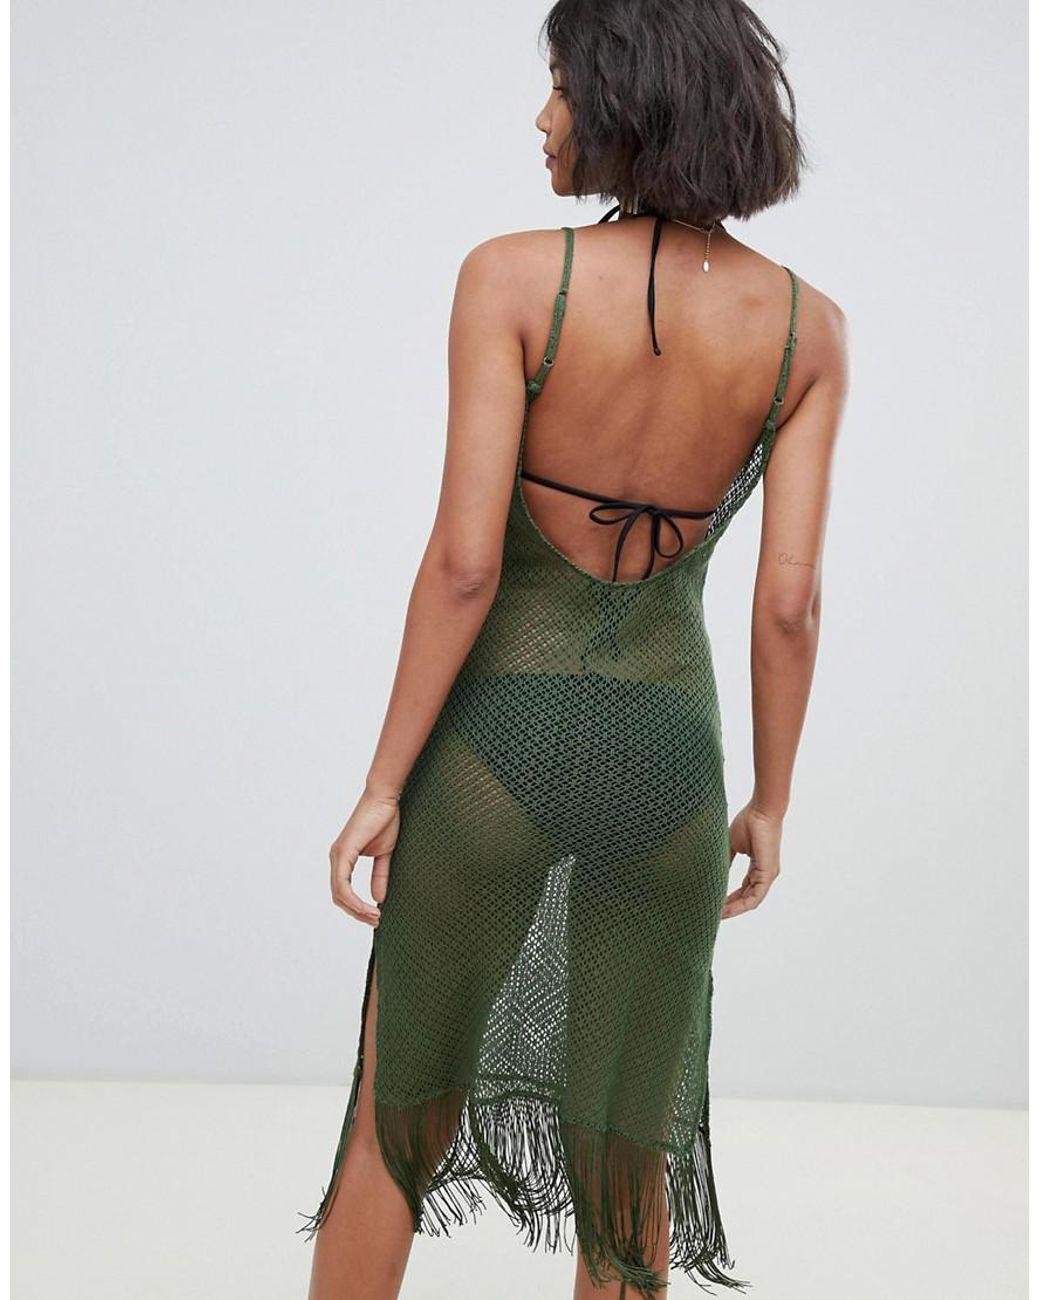 cfd3b8250736 Akasa Exclusive Loose Knit Mesh Beach Dress In Khaki in Green - Lyst